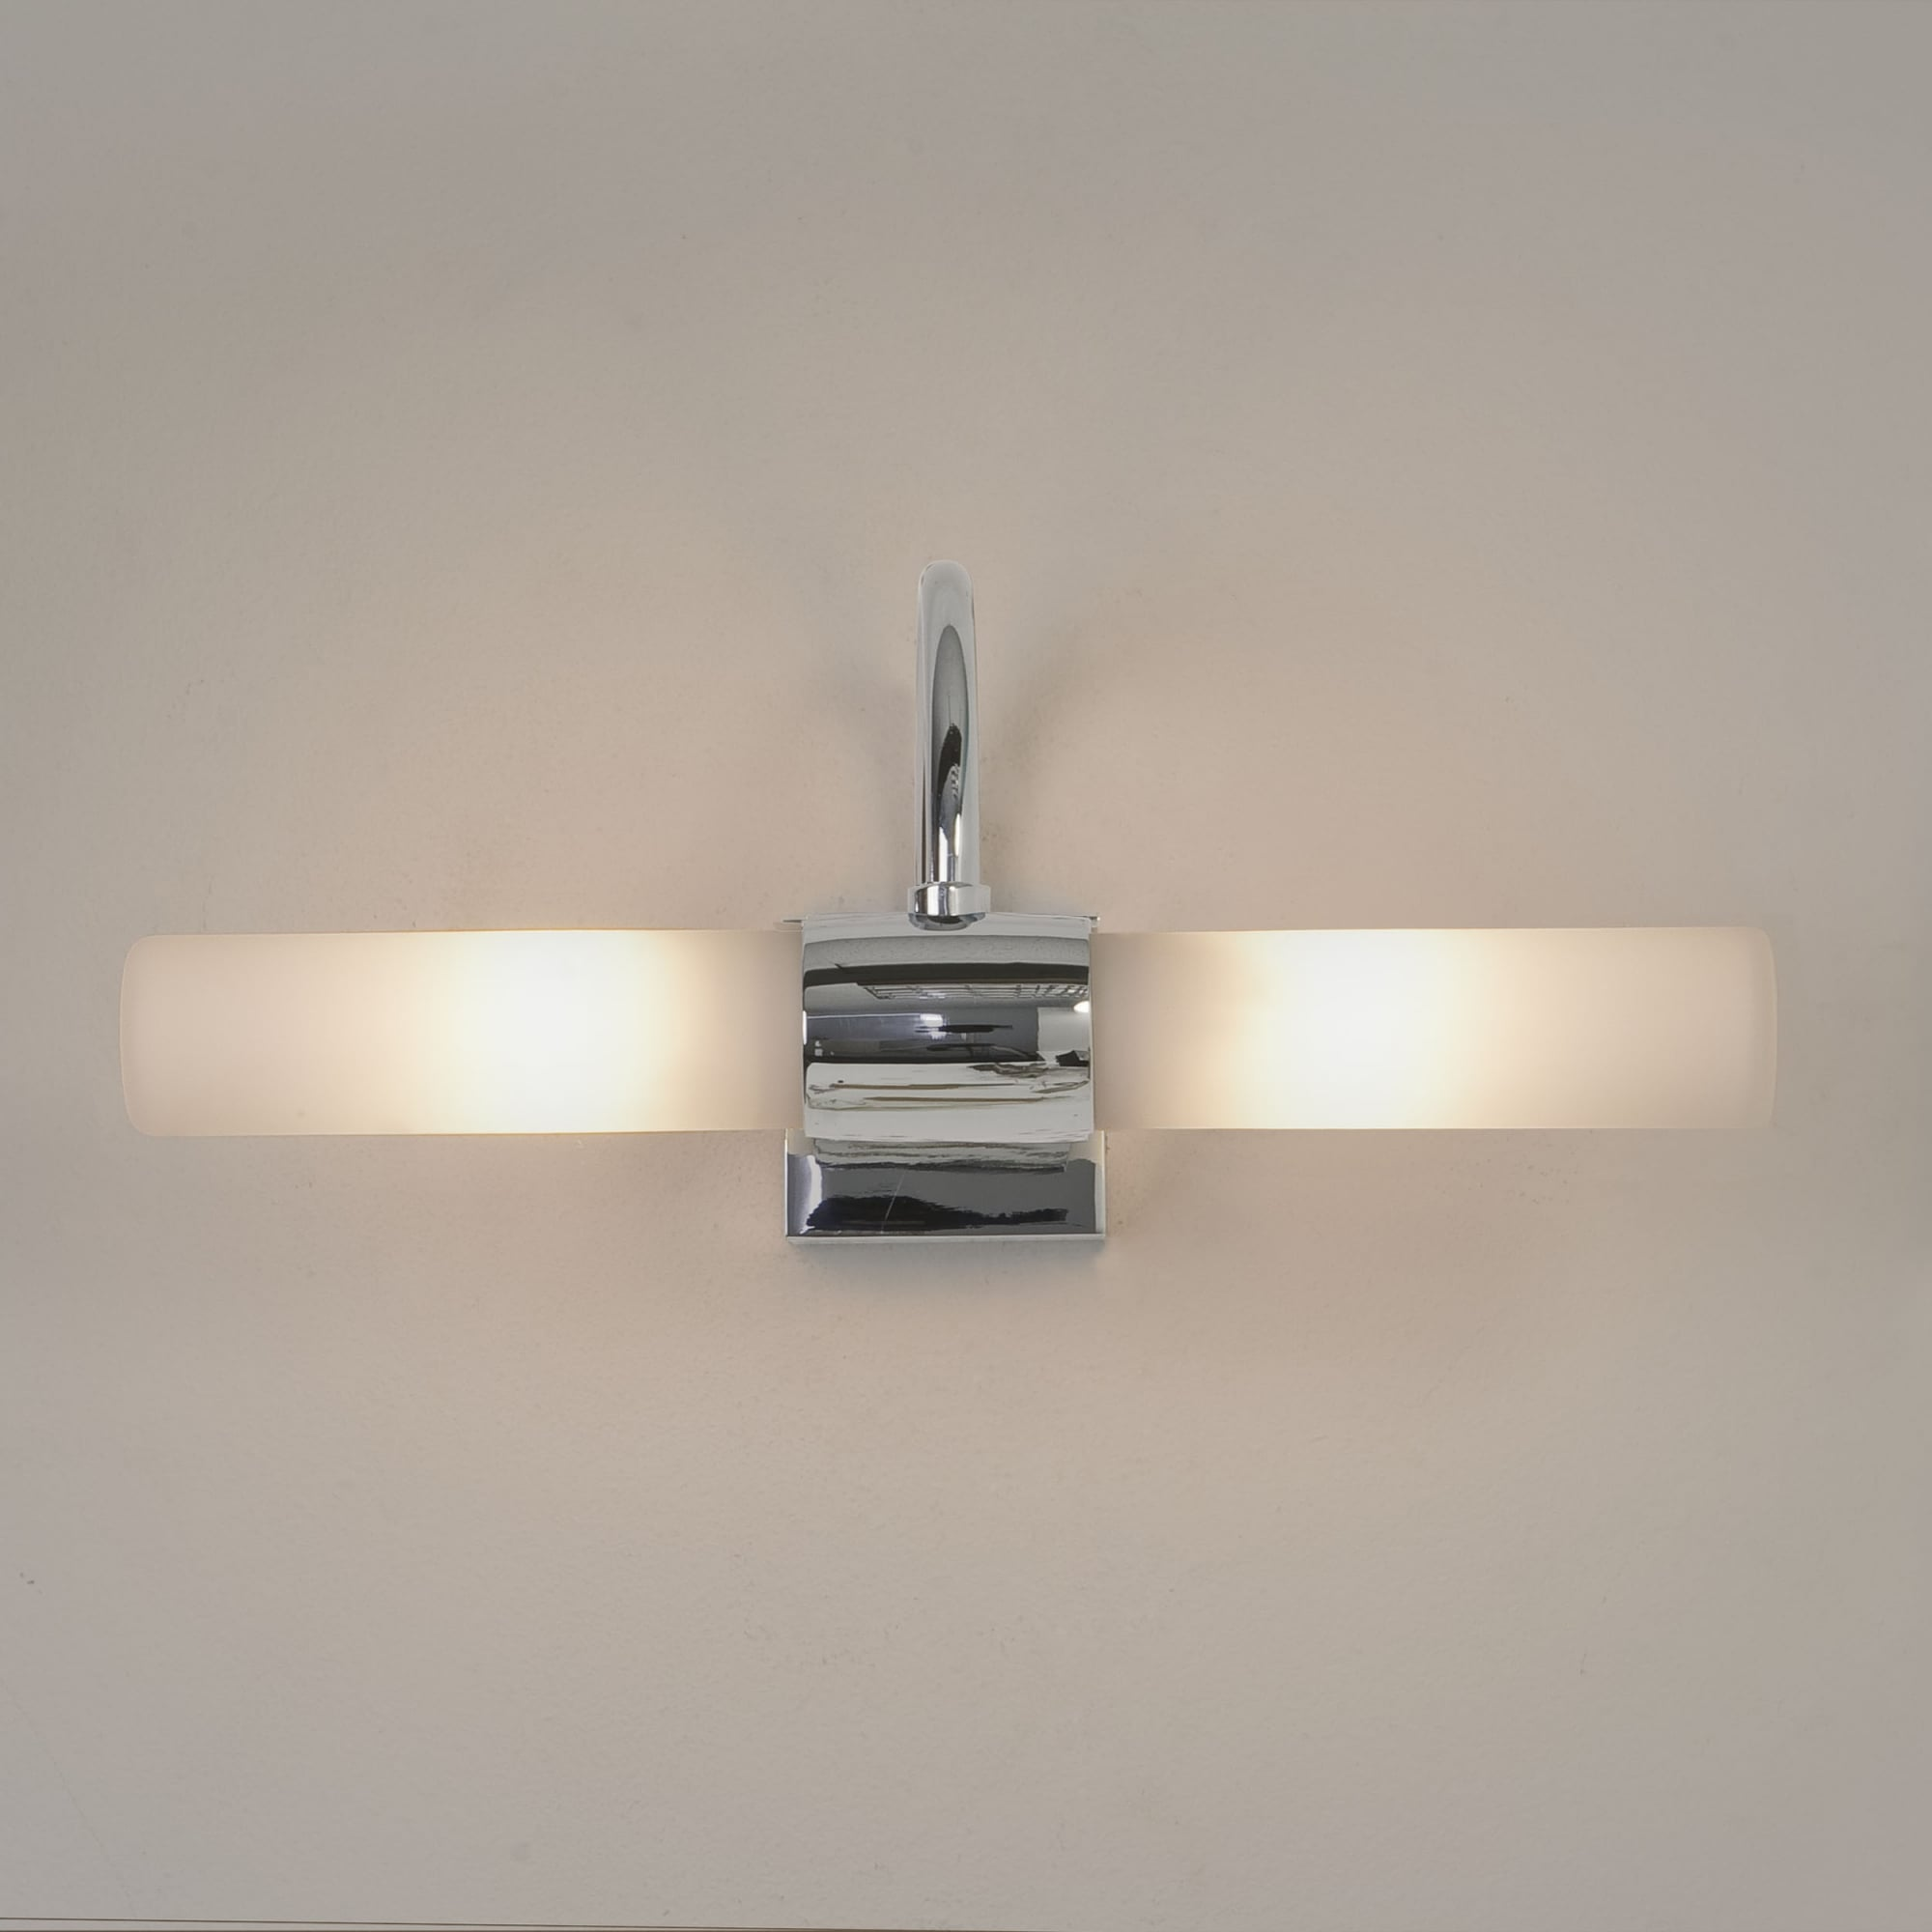 Astro 1044001 Dayton Twin Glass Tube Over Mirror Wall Light Chrome Ideas4lighting Sku34425i4l